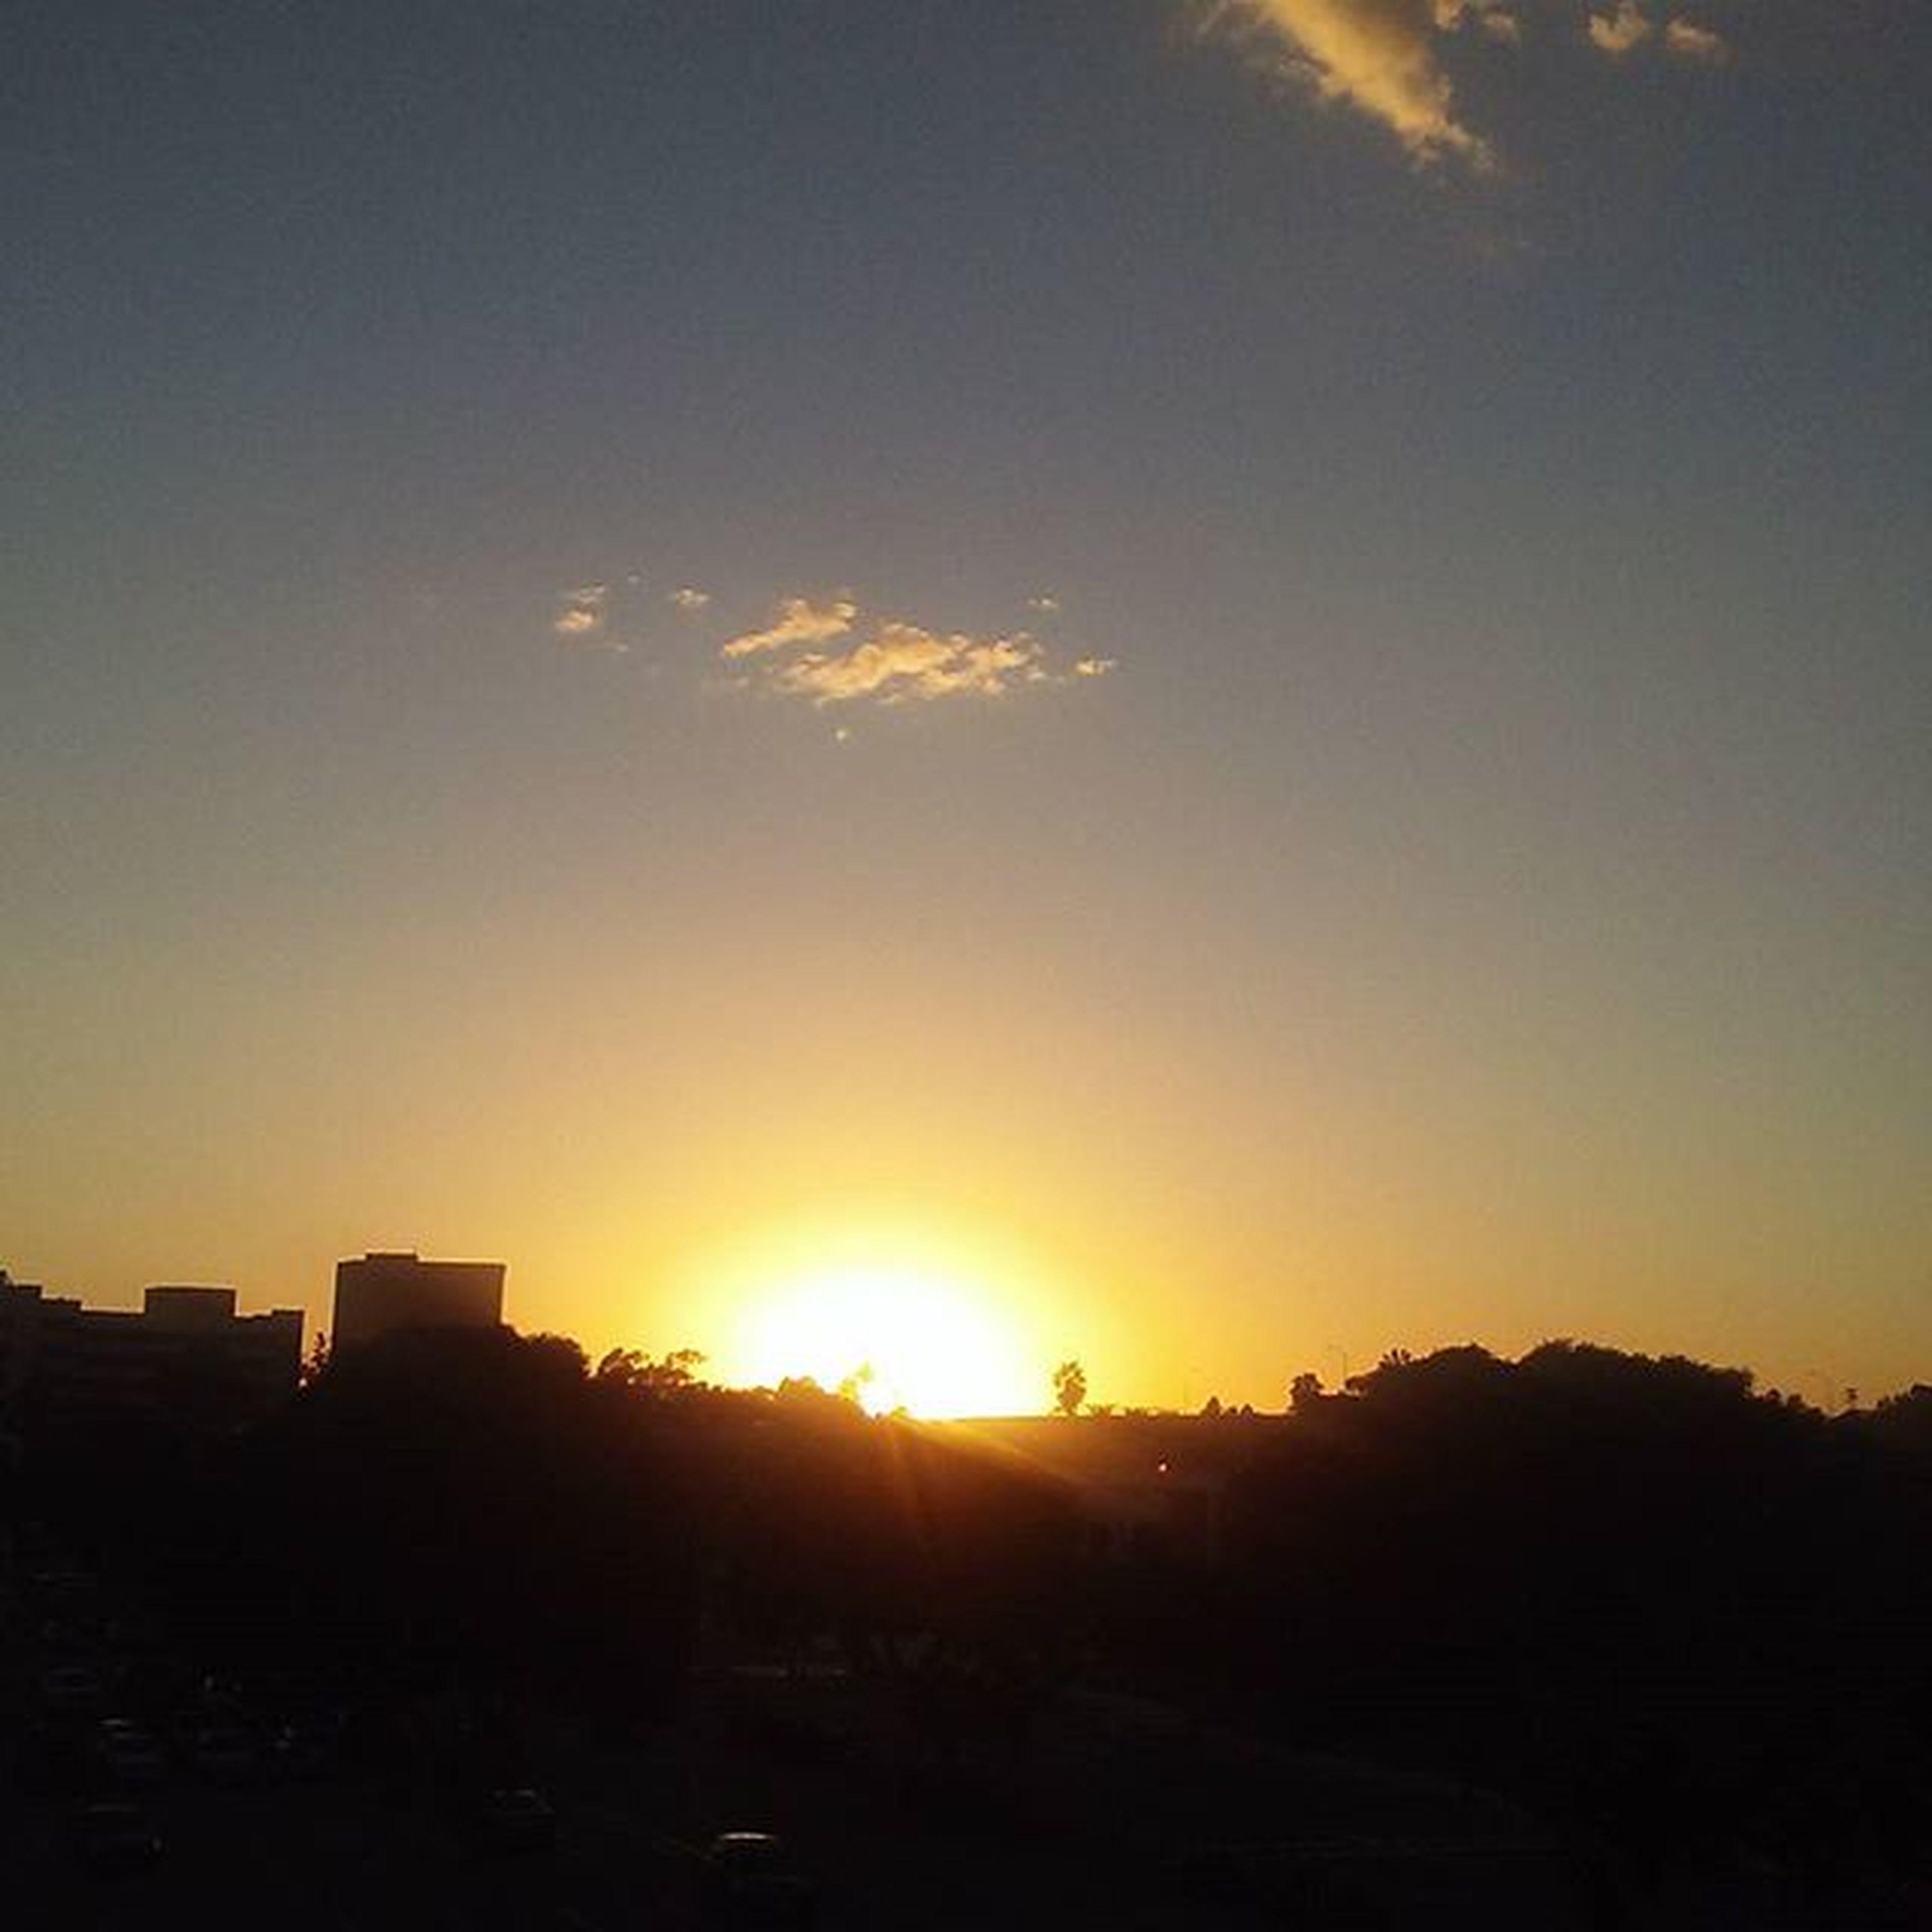 sunset, sun, silhouette, building exterior, sky, built structure, architecture, sunbeam, sunlight, scenics, beauty in nature, orange color, landscape, tranquil scene, nature, tranquility, house, cloud - sky, lens flare, idyllic